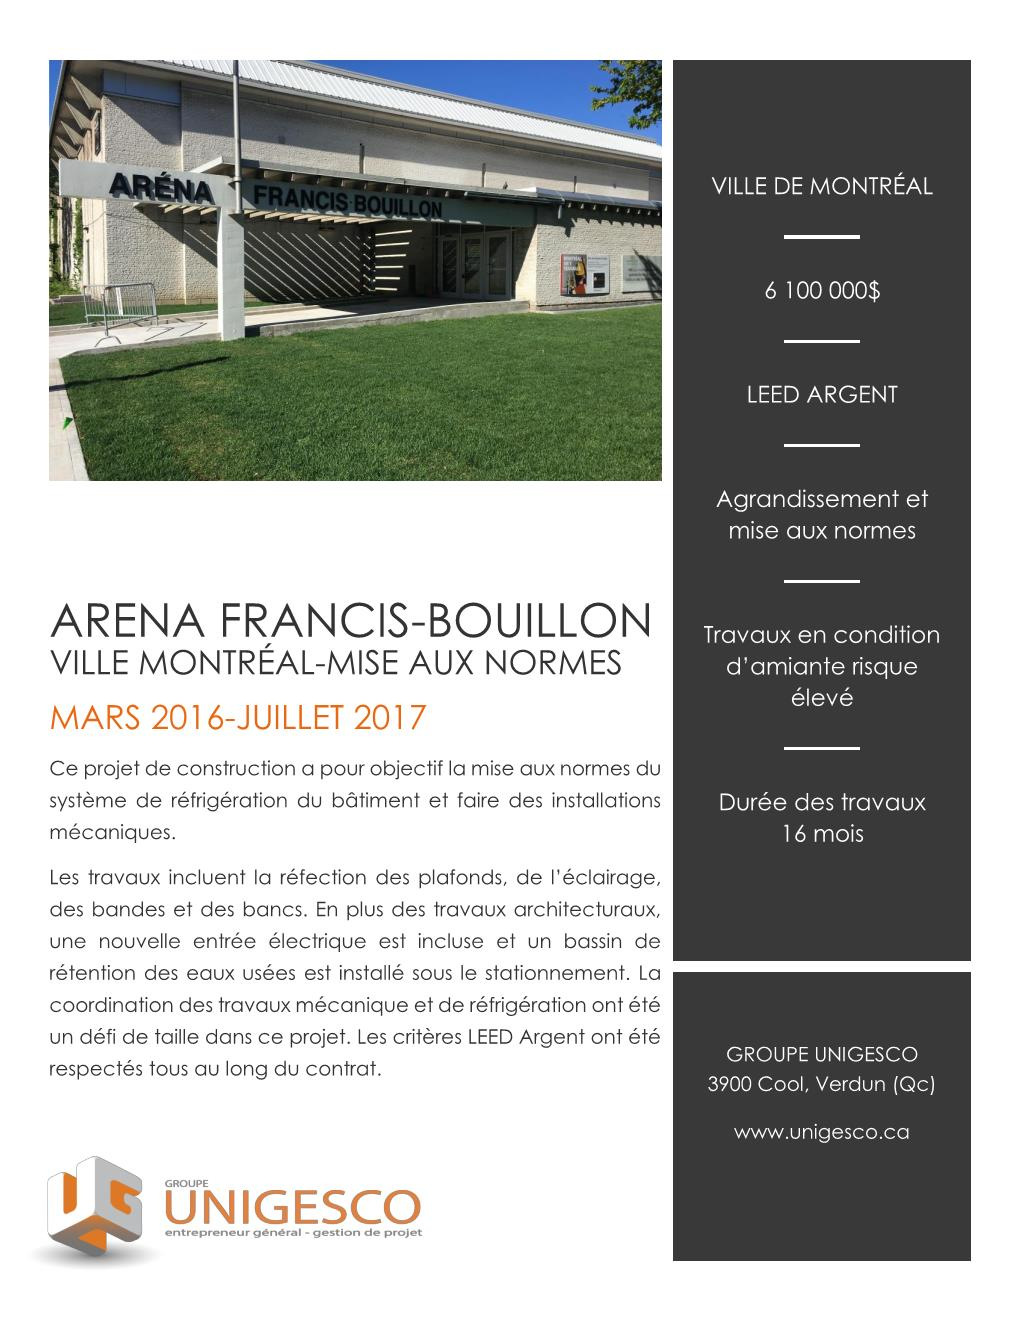 FP-UGC-ARENA FRANCIS BOUILLON-R02-UGC1509008.jpg